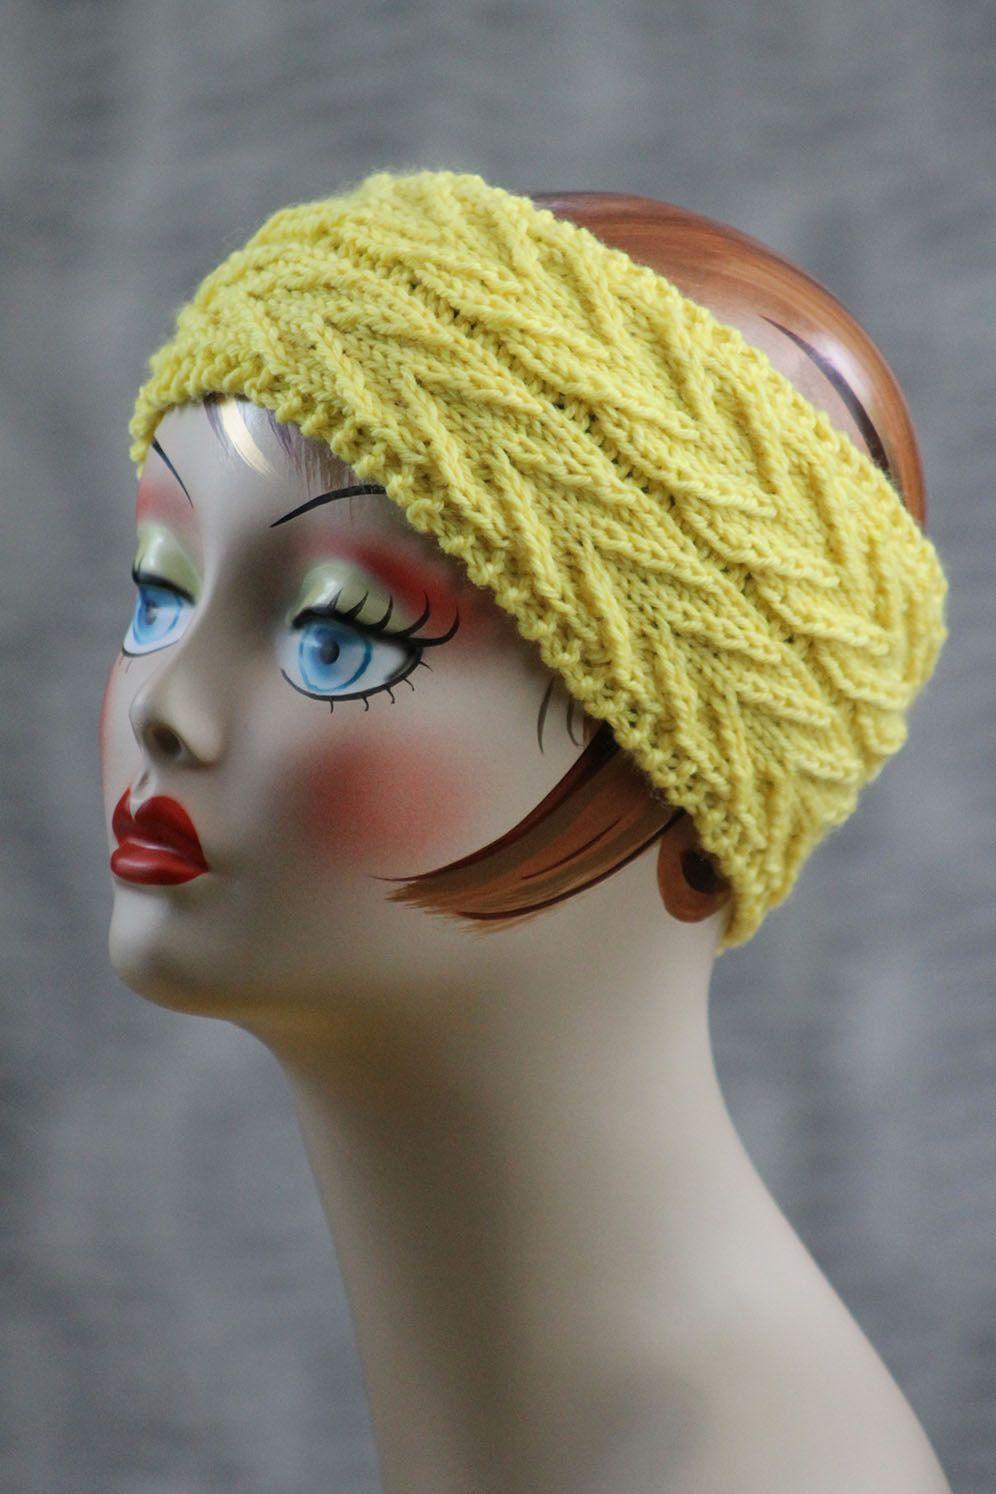 Free+Knitting+Pattern+-+Hats:+Around+We+Go+Headband | Knitted hats ...